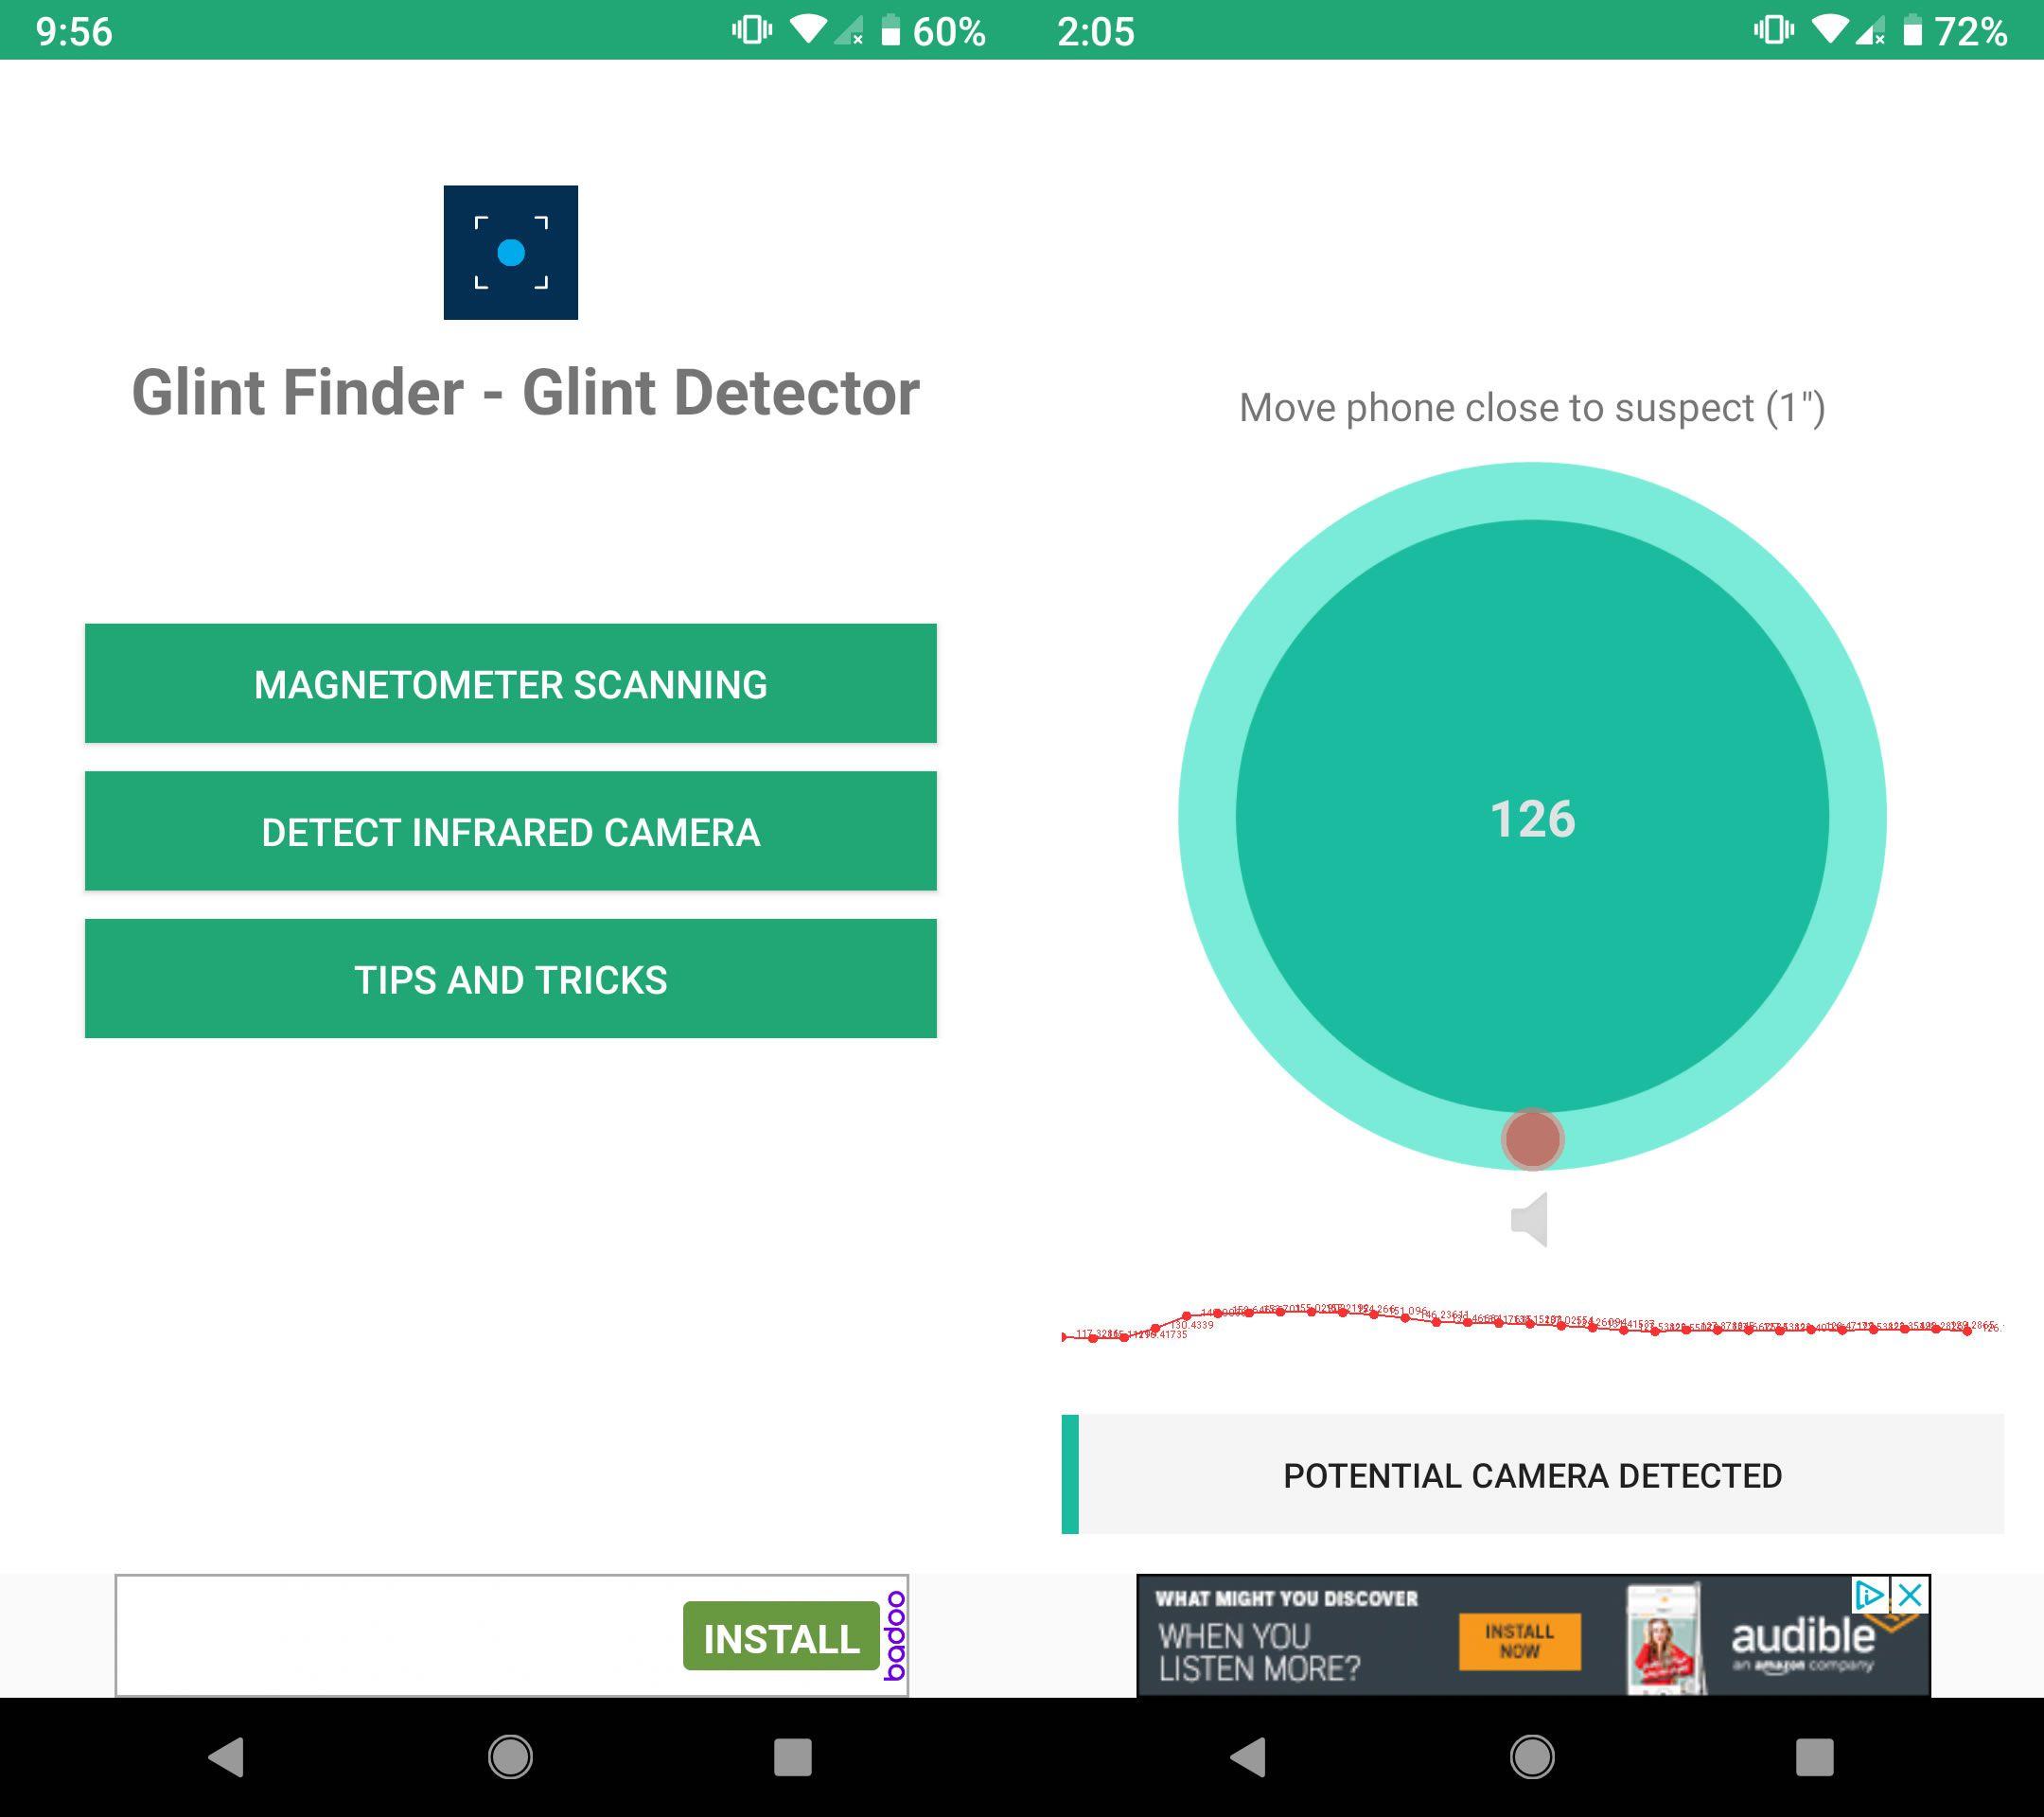 A screenshot showing Glint Finder using magneticometer scanning.